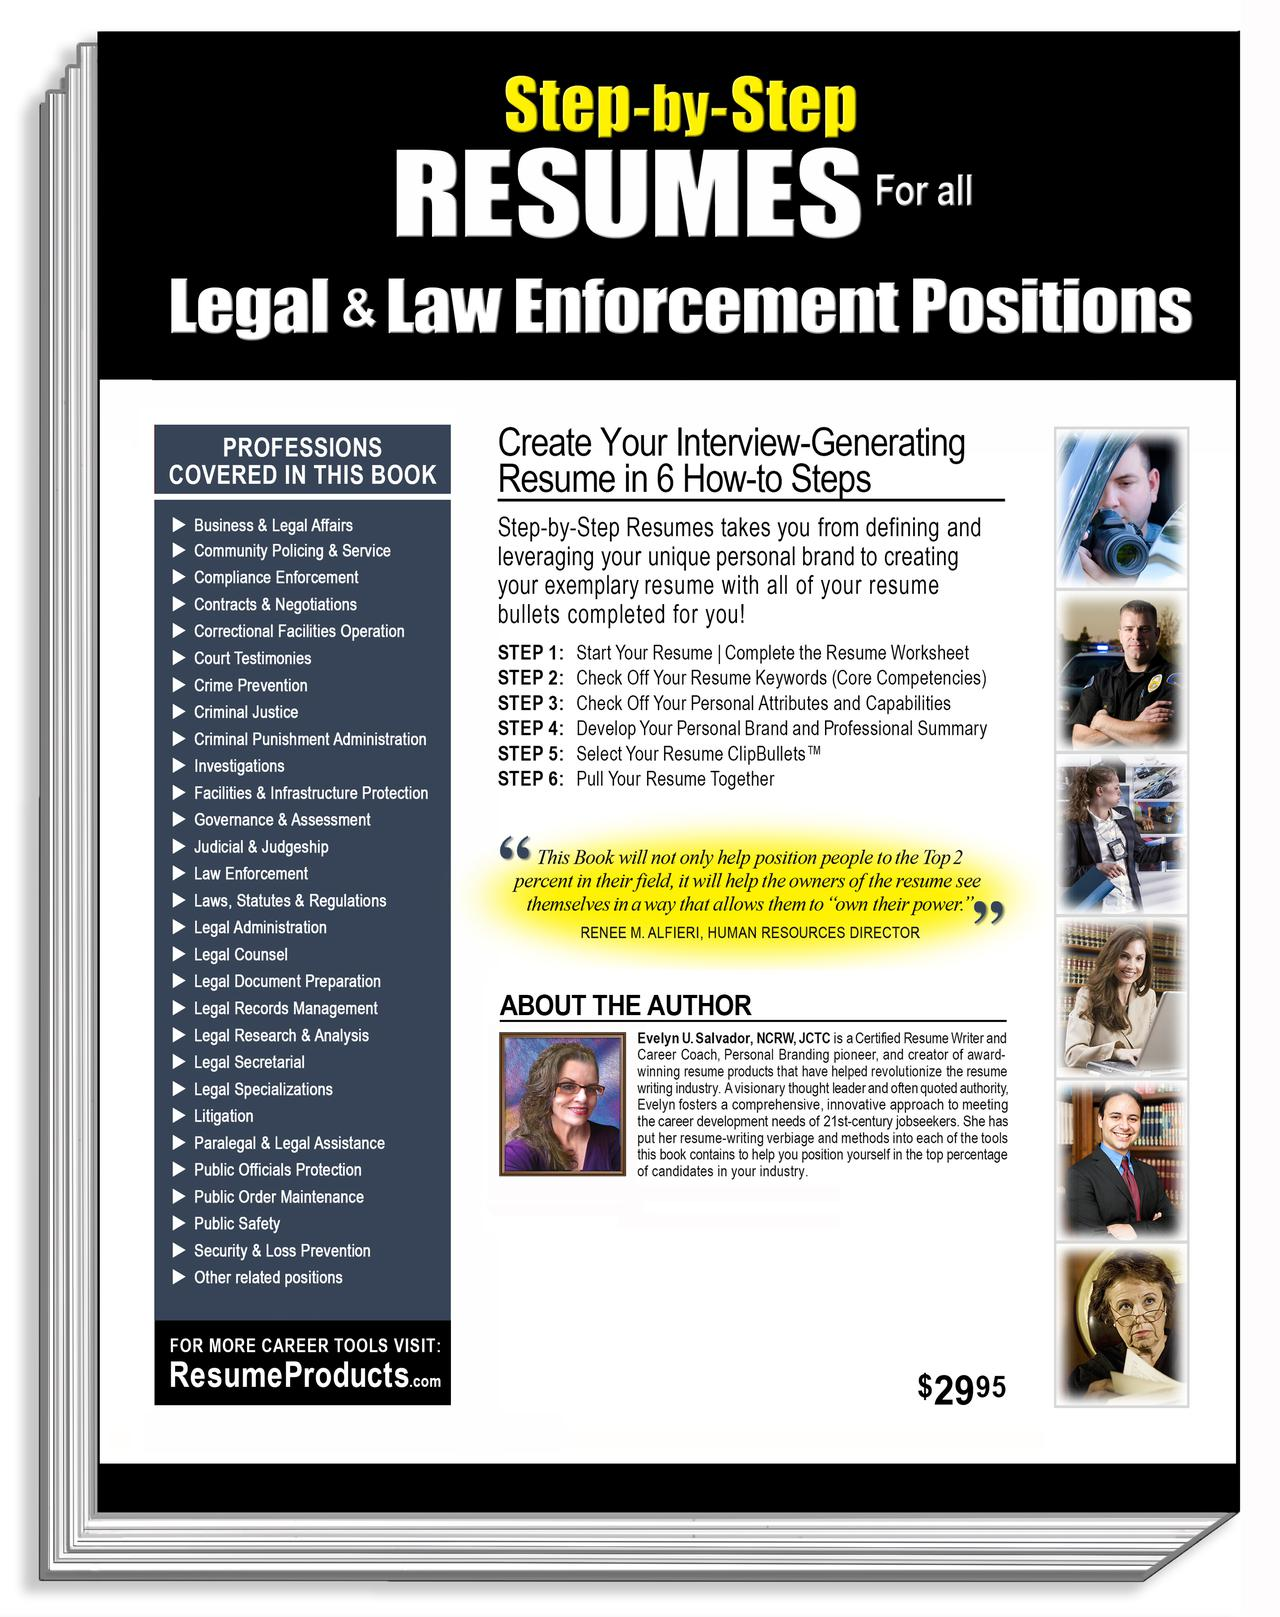 legal & law enforcement bc.jpg